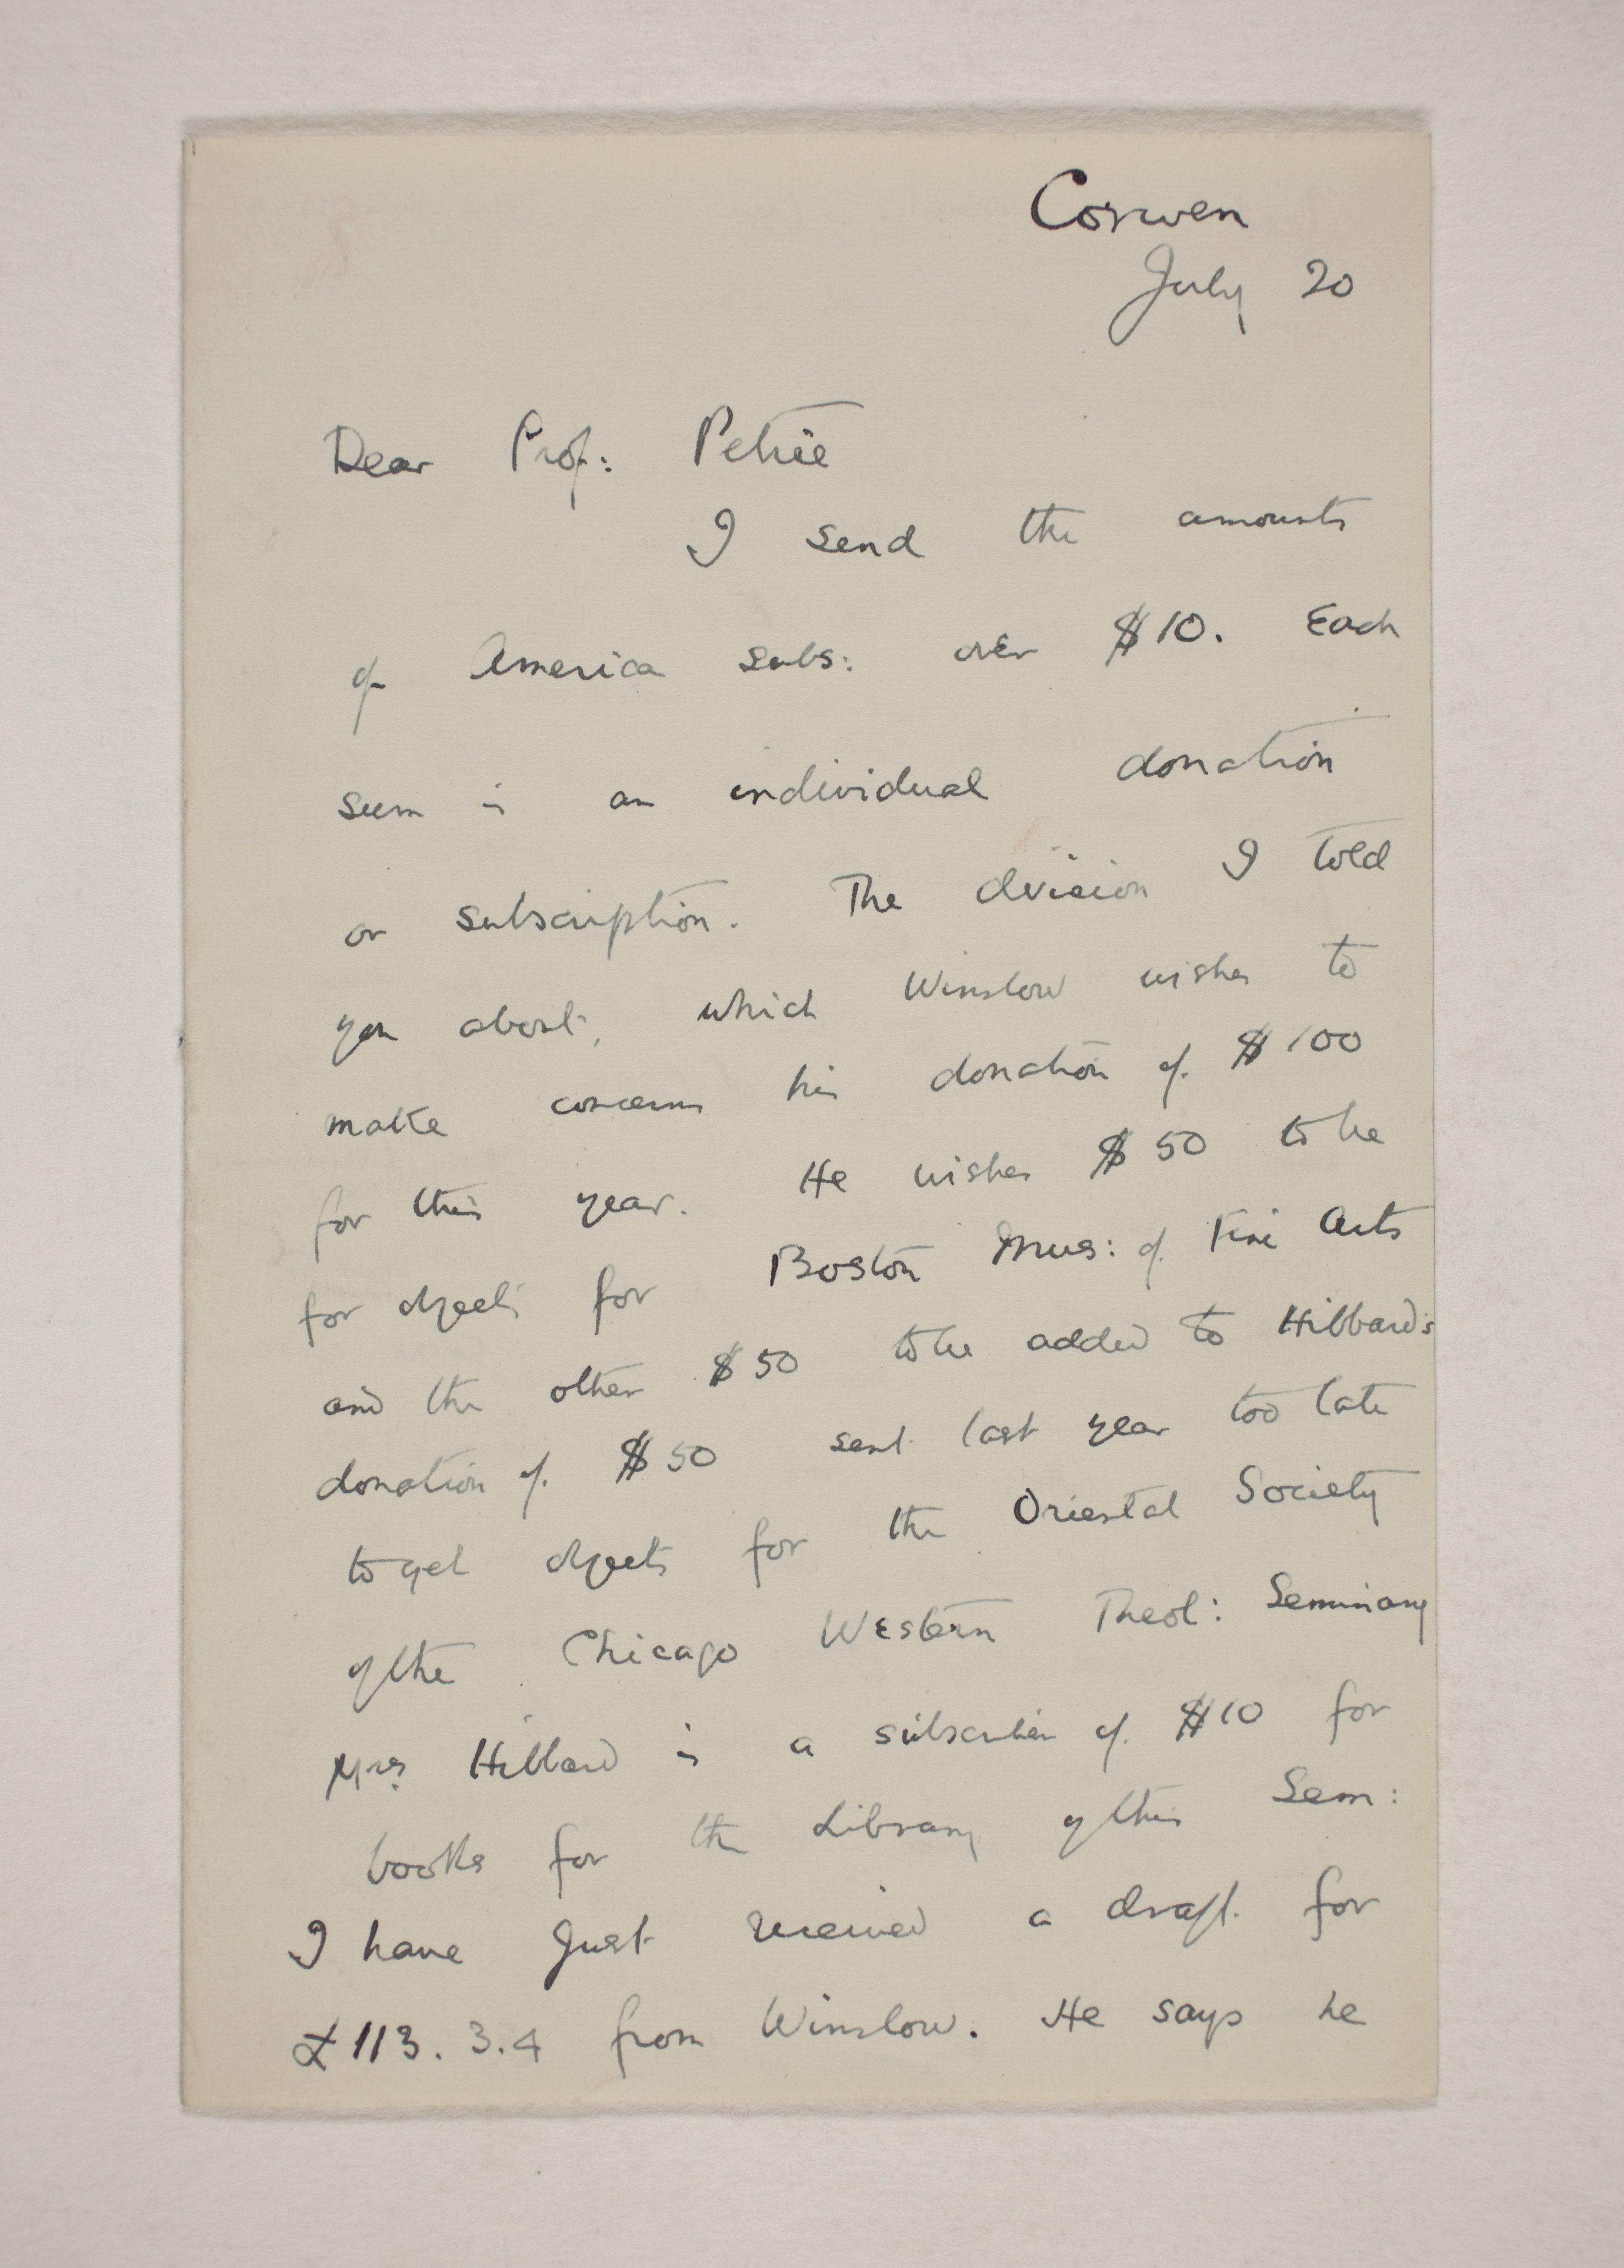 1909-10 Meidum, Memphis Correspondence PMA/WFP1/D/18/12.1